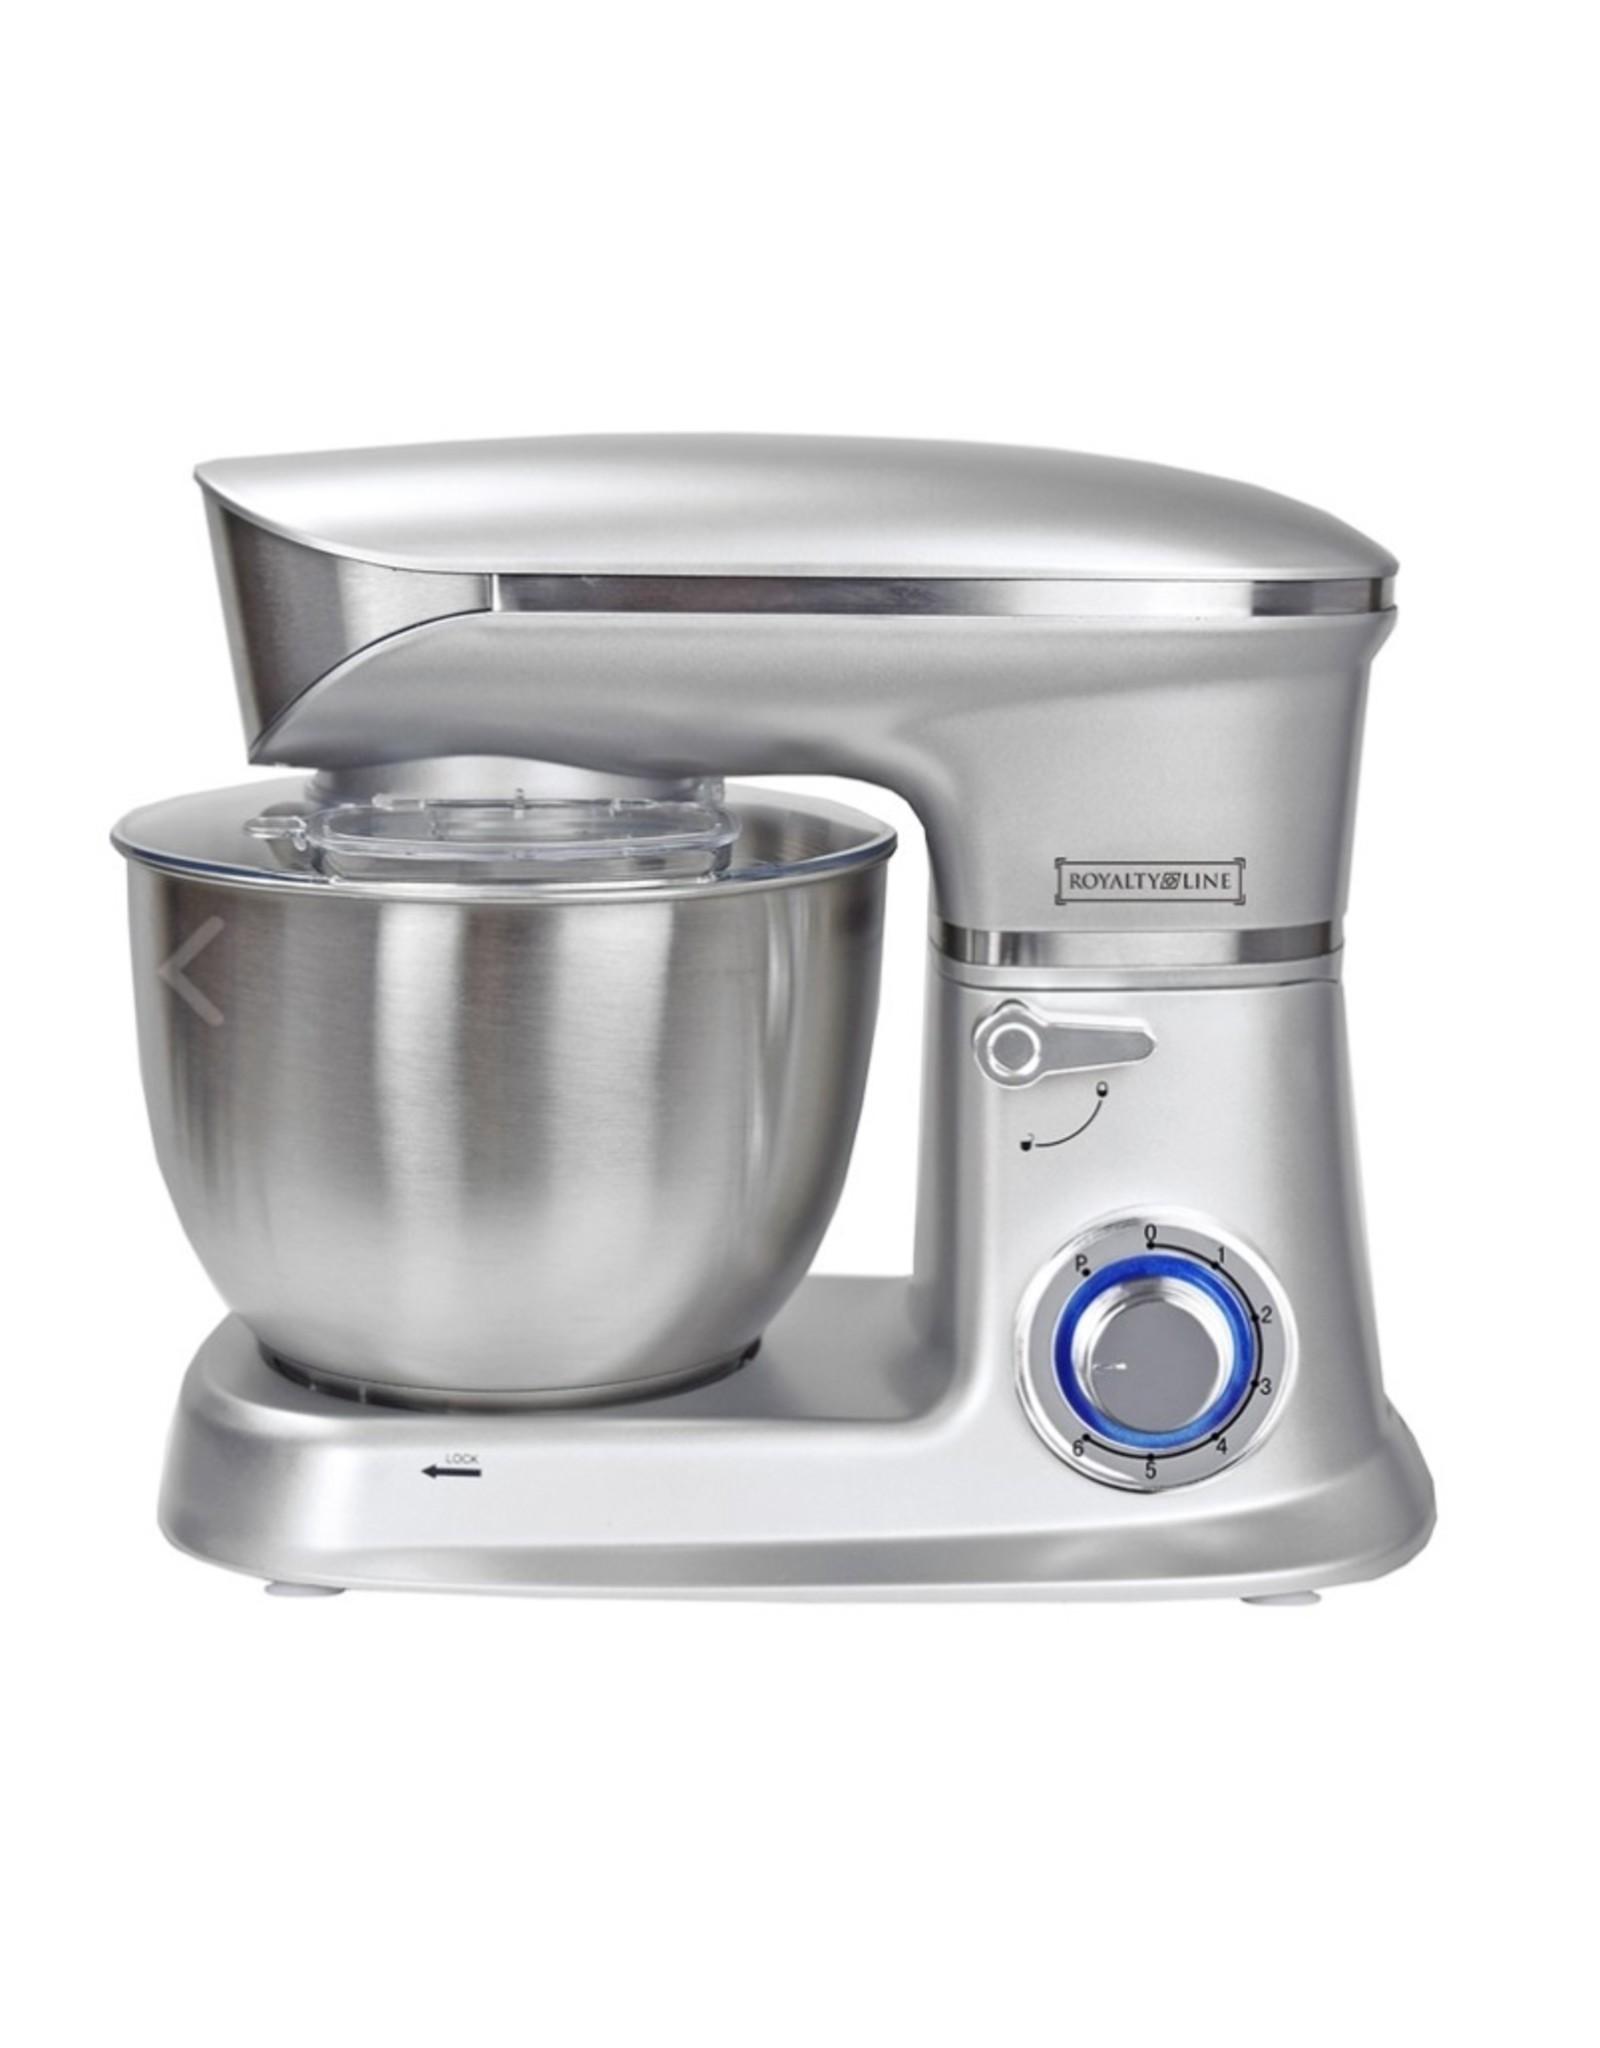 Royalty Line Royalty Line - Food processor - Silver